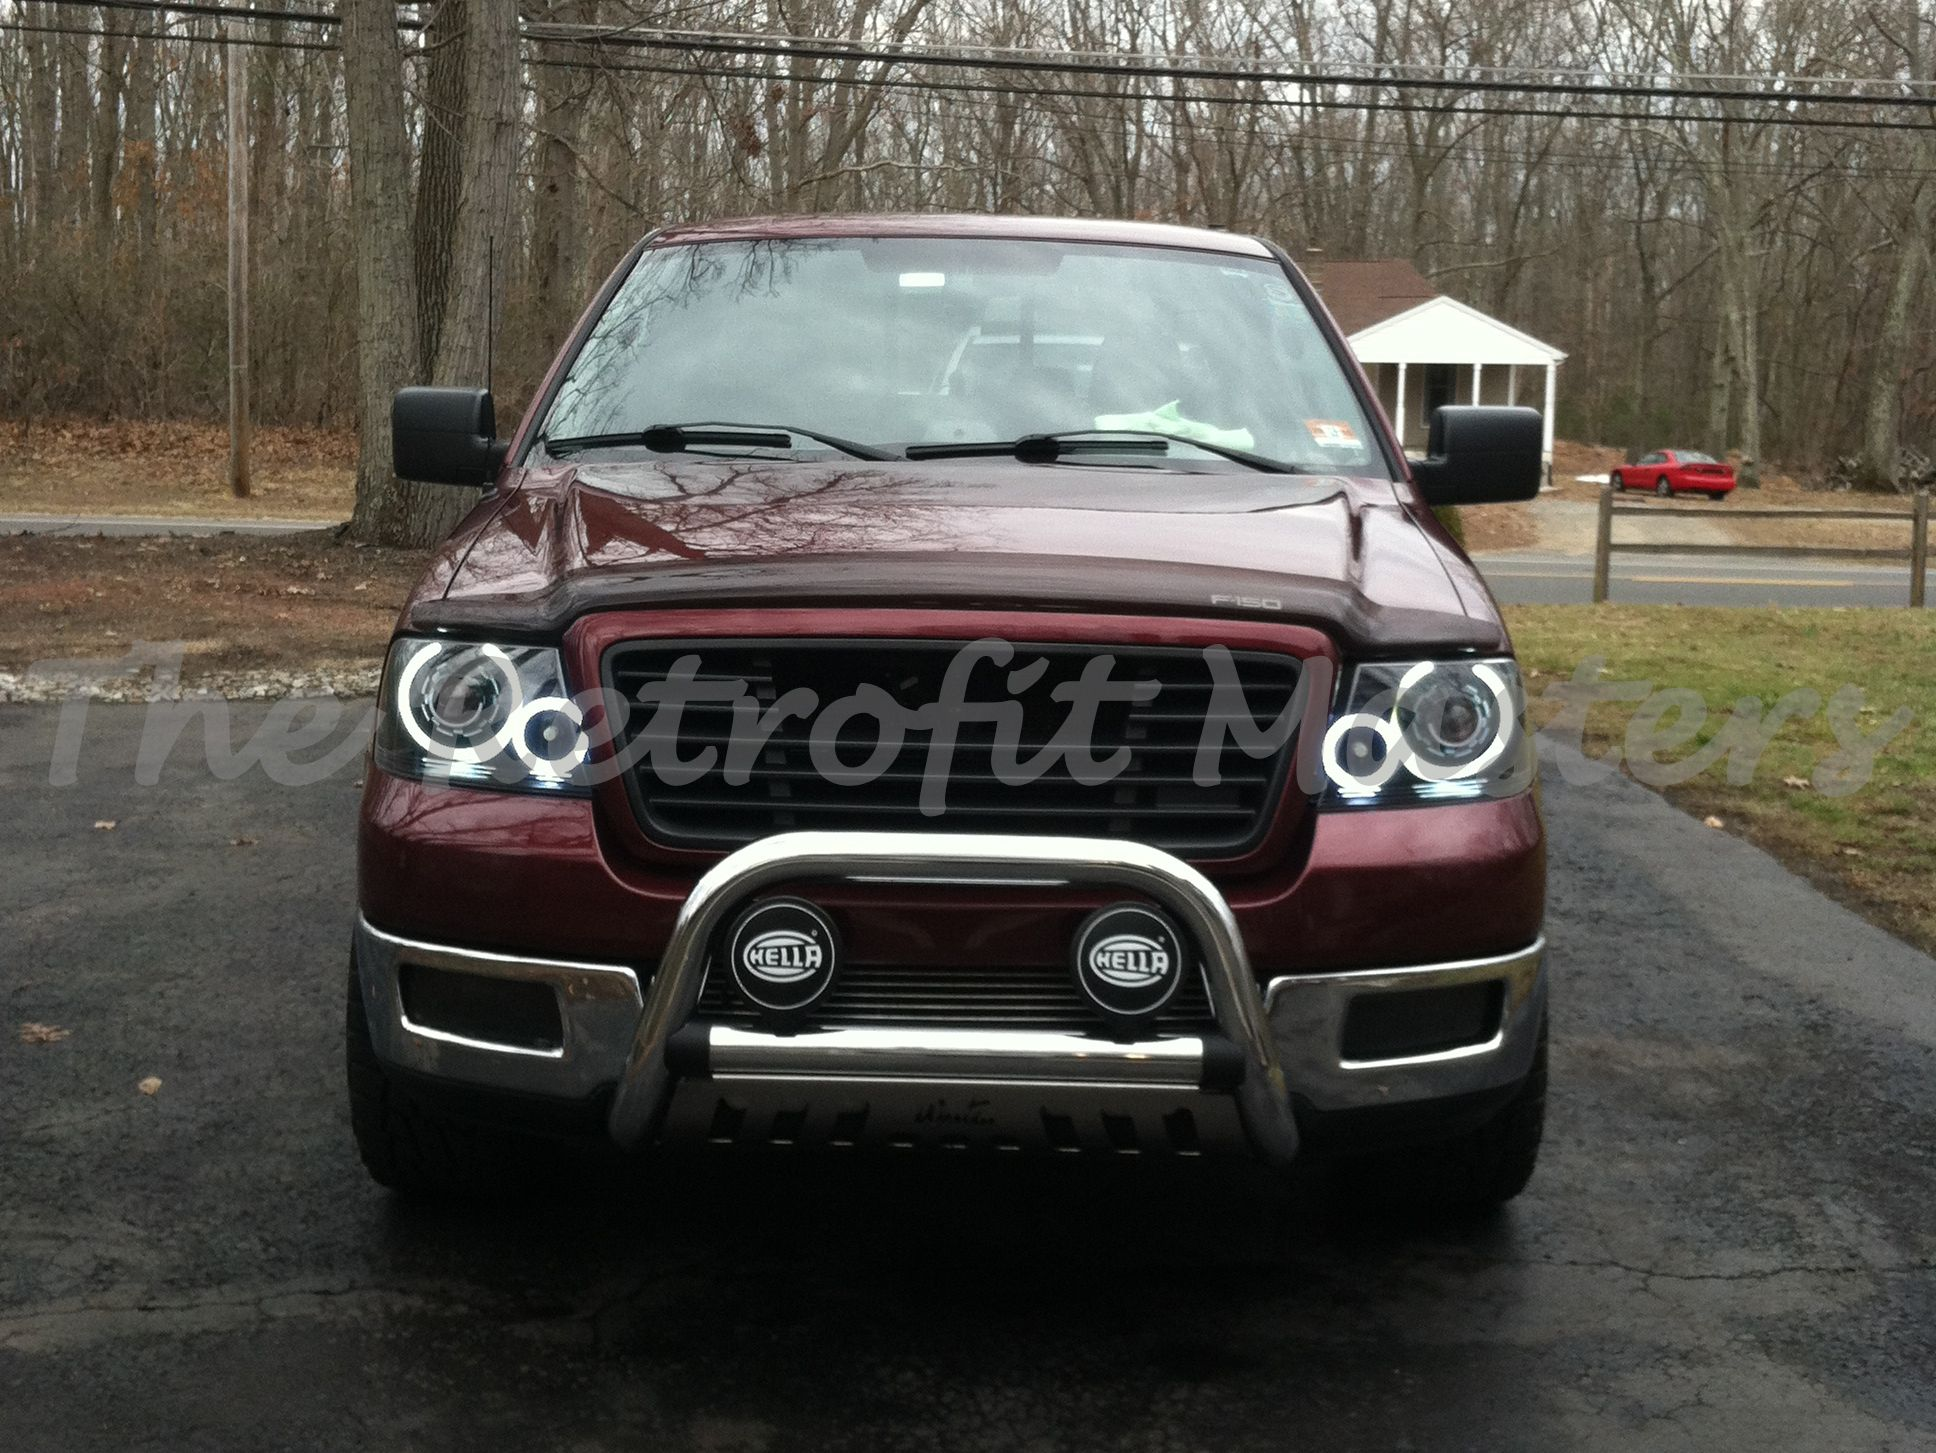 2004 2008 ford f 150 headlights retrofitted w morimoto mini h1